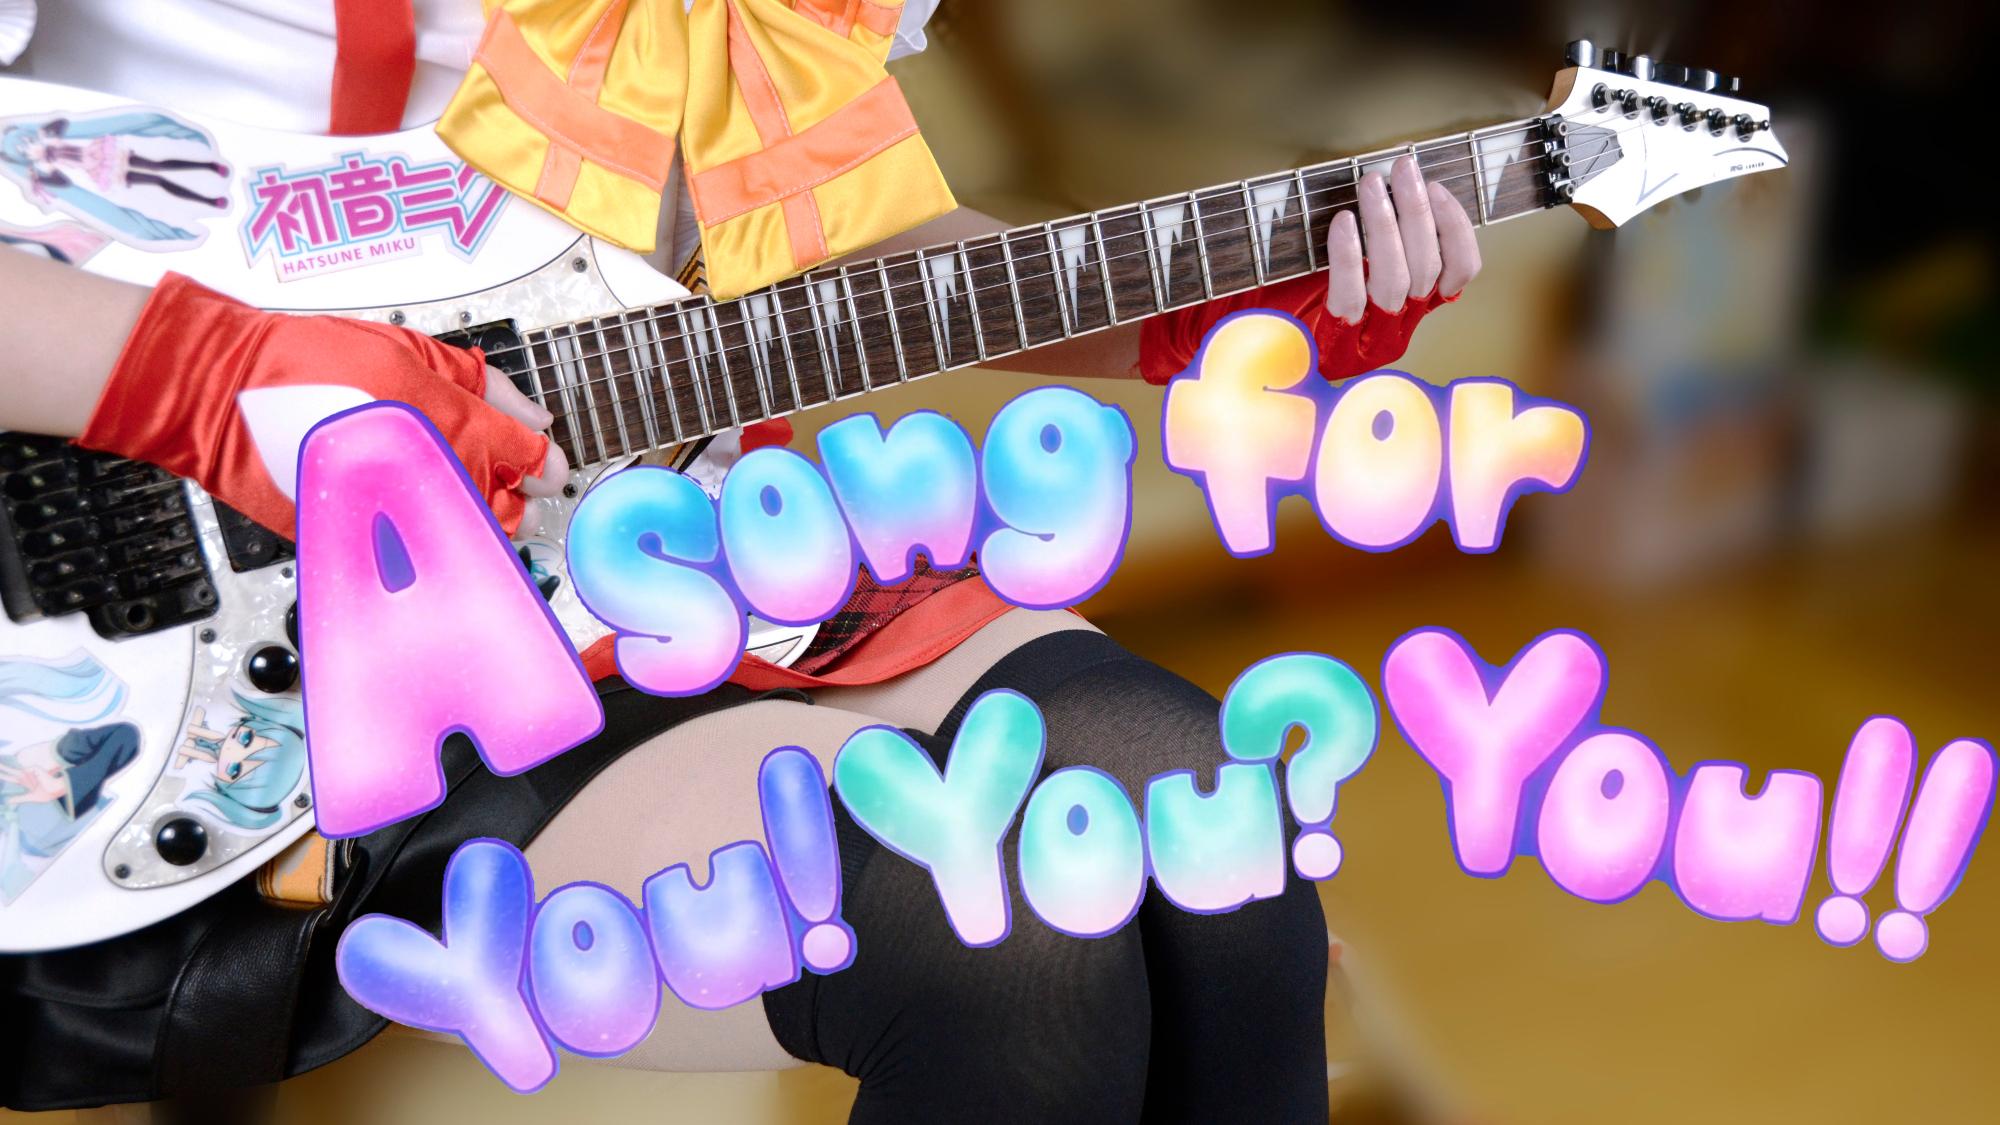 【电吉他】μ's-A song for You!You?You!!完整版演奏